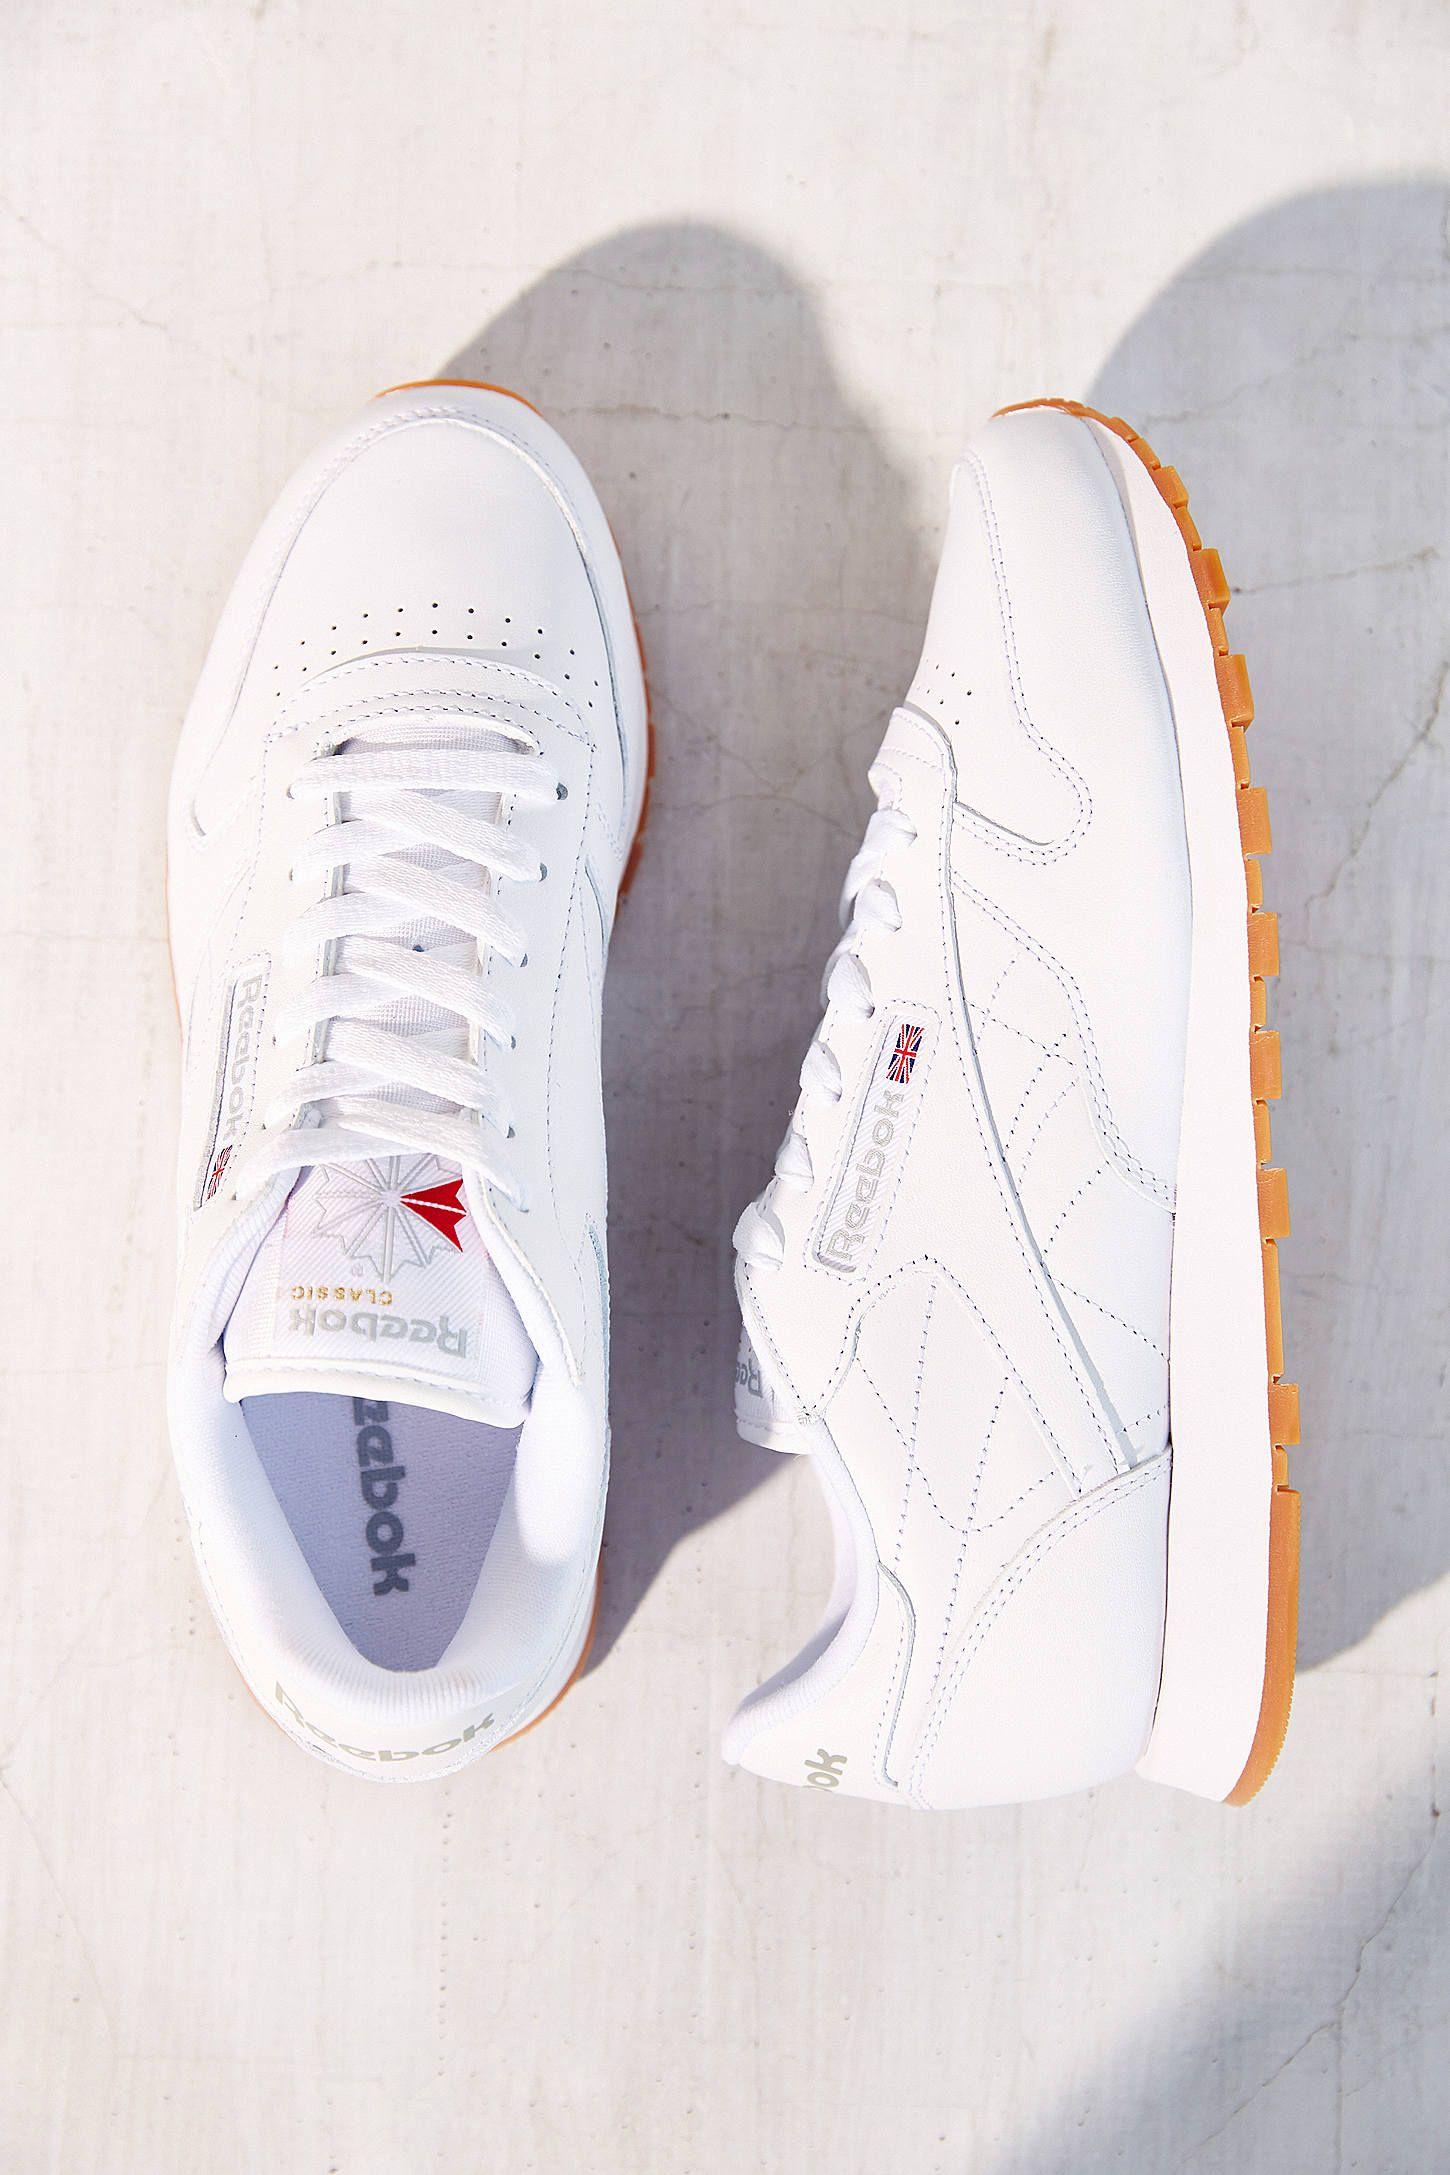 66bdeab210e2 Slide View  1  Reebok Classic Gum Sole Sneaker